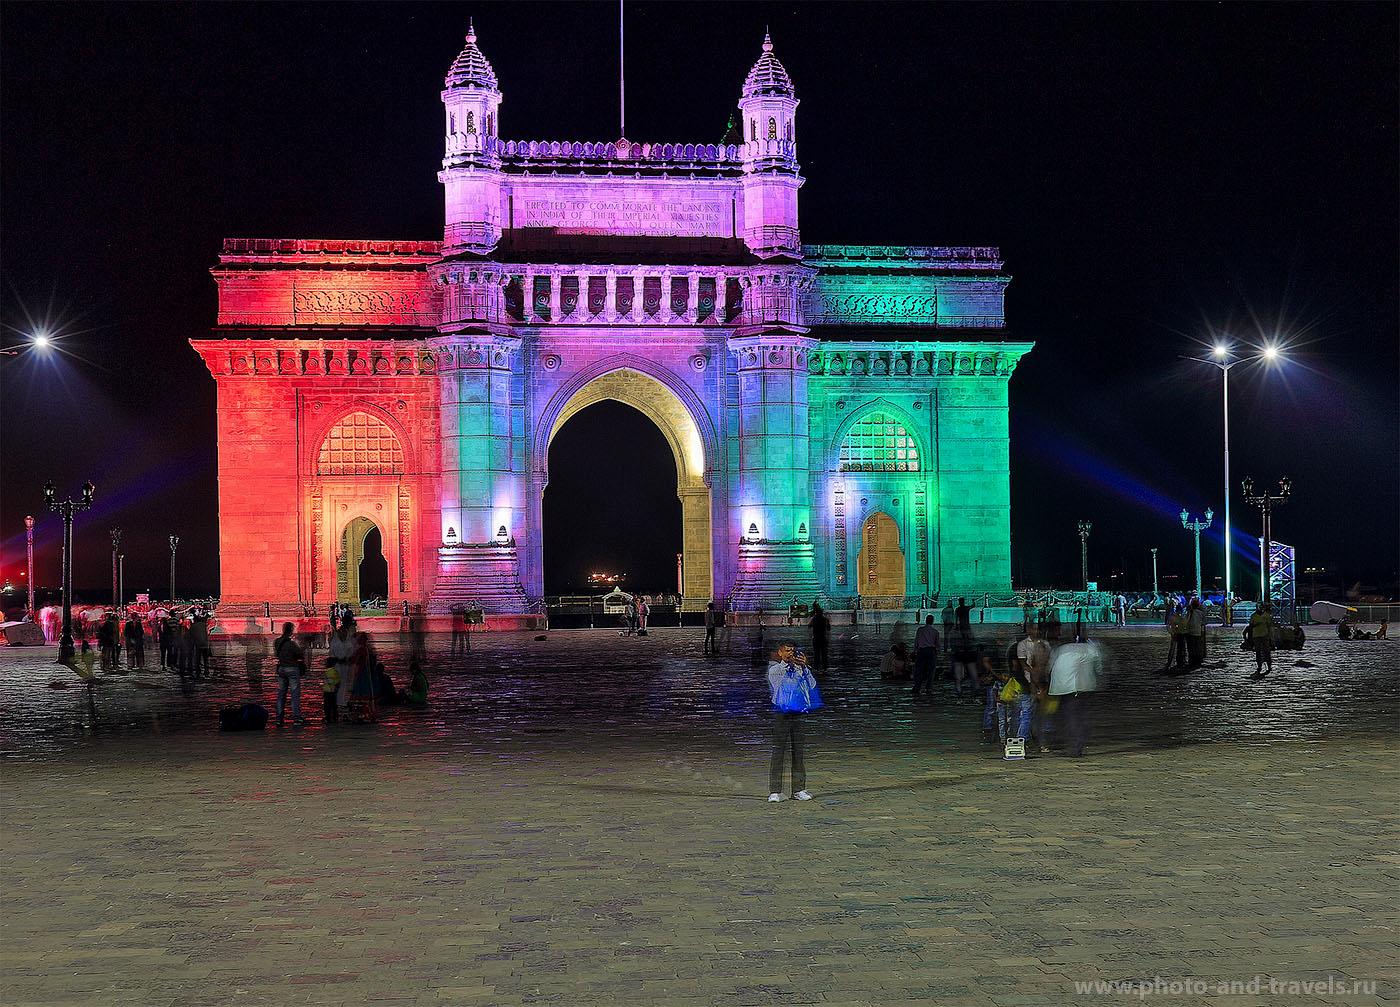 Фото 17. Арка Ворота в Индию в Мумбаи. Ночная фотография